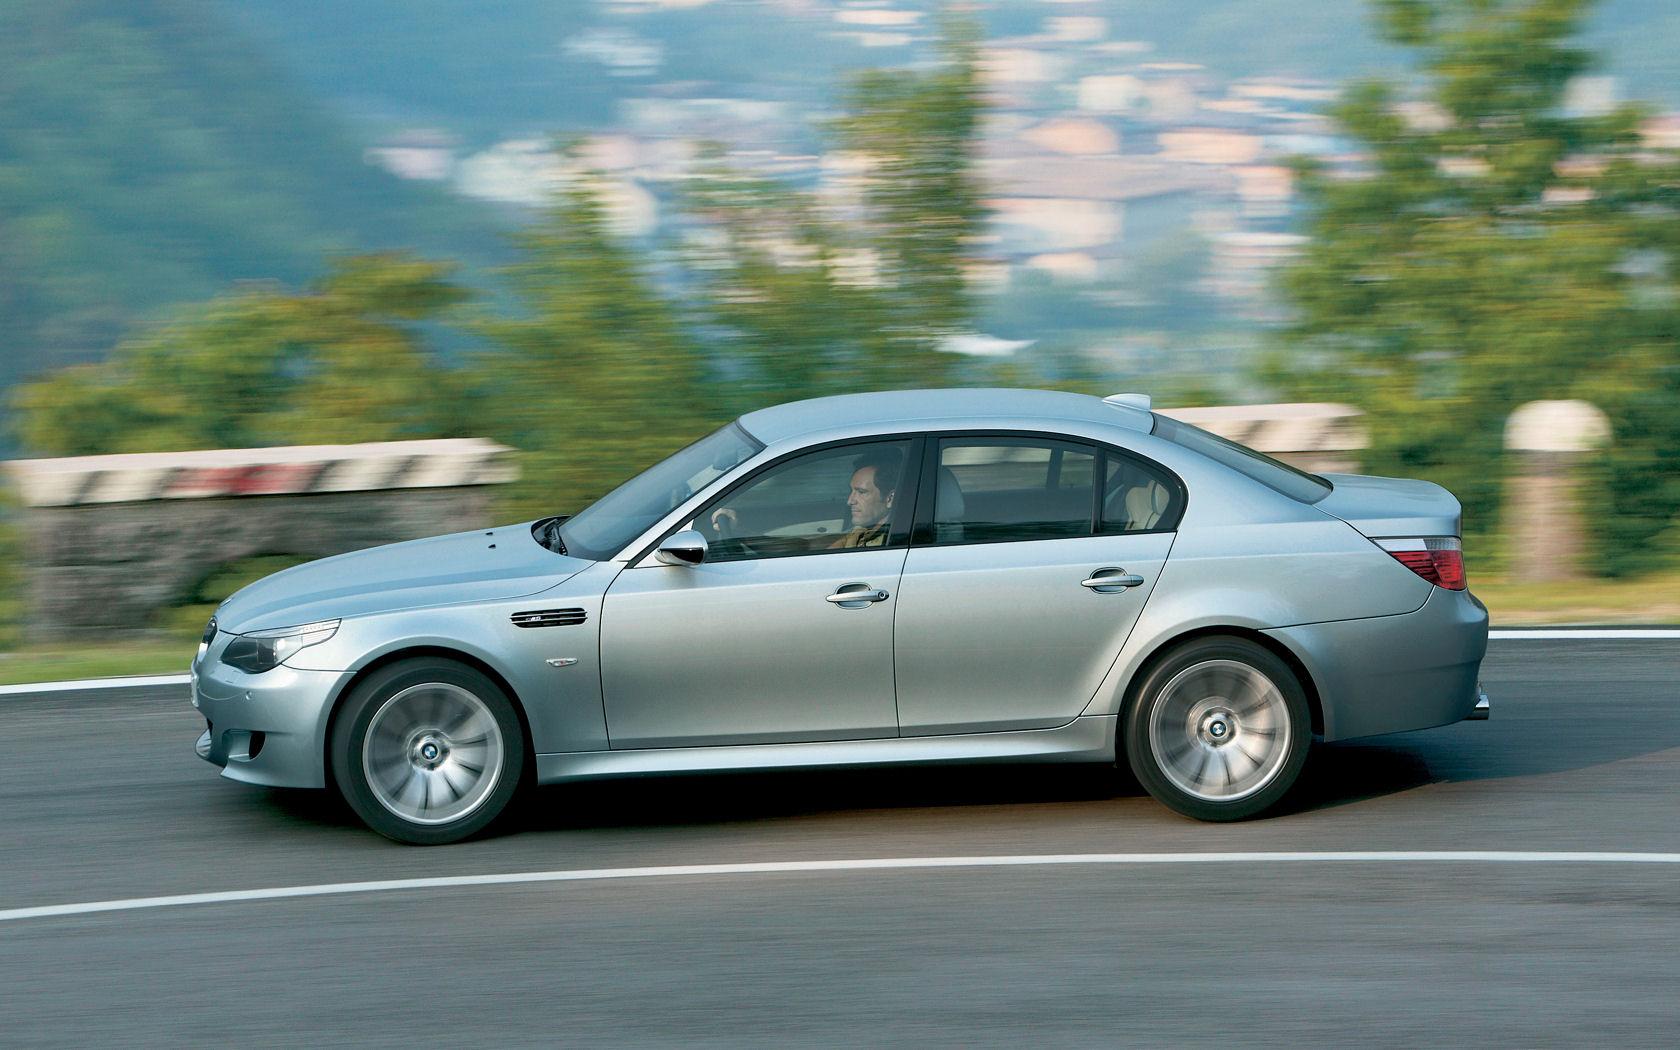 BMW BMW 5 Series BMW 5 Series Desktop Wallpapers Widescreen 1680x1050